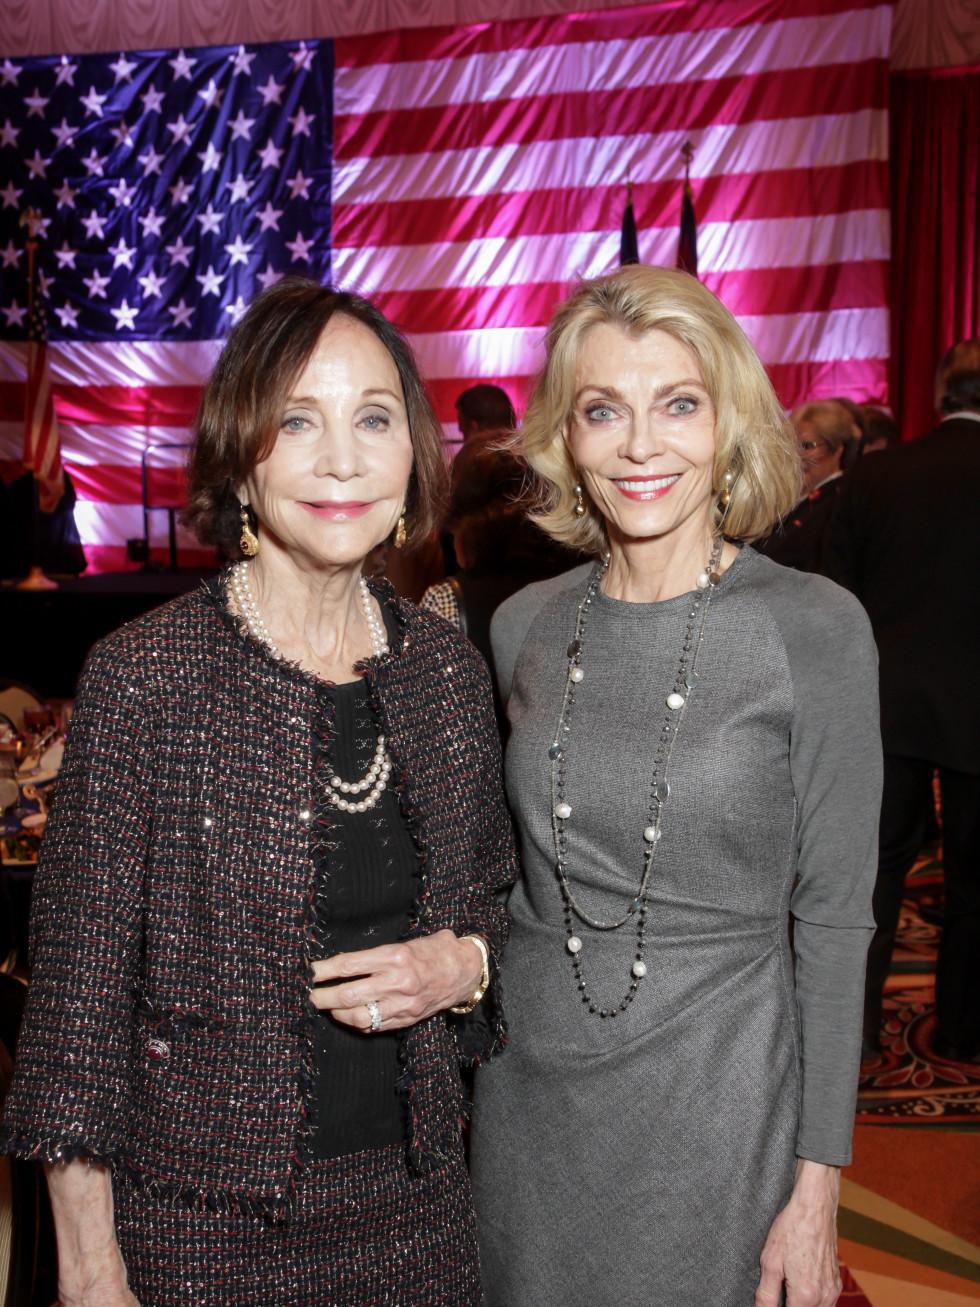 News, Shelby, Salvation Army luncheon, Nov. 2015, Cornelia Long, Alice Burgueries